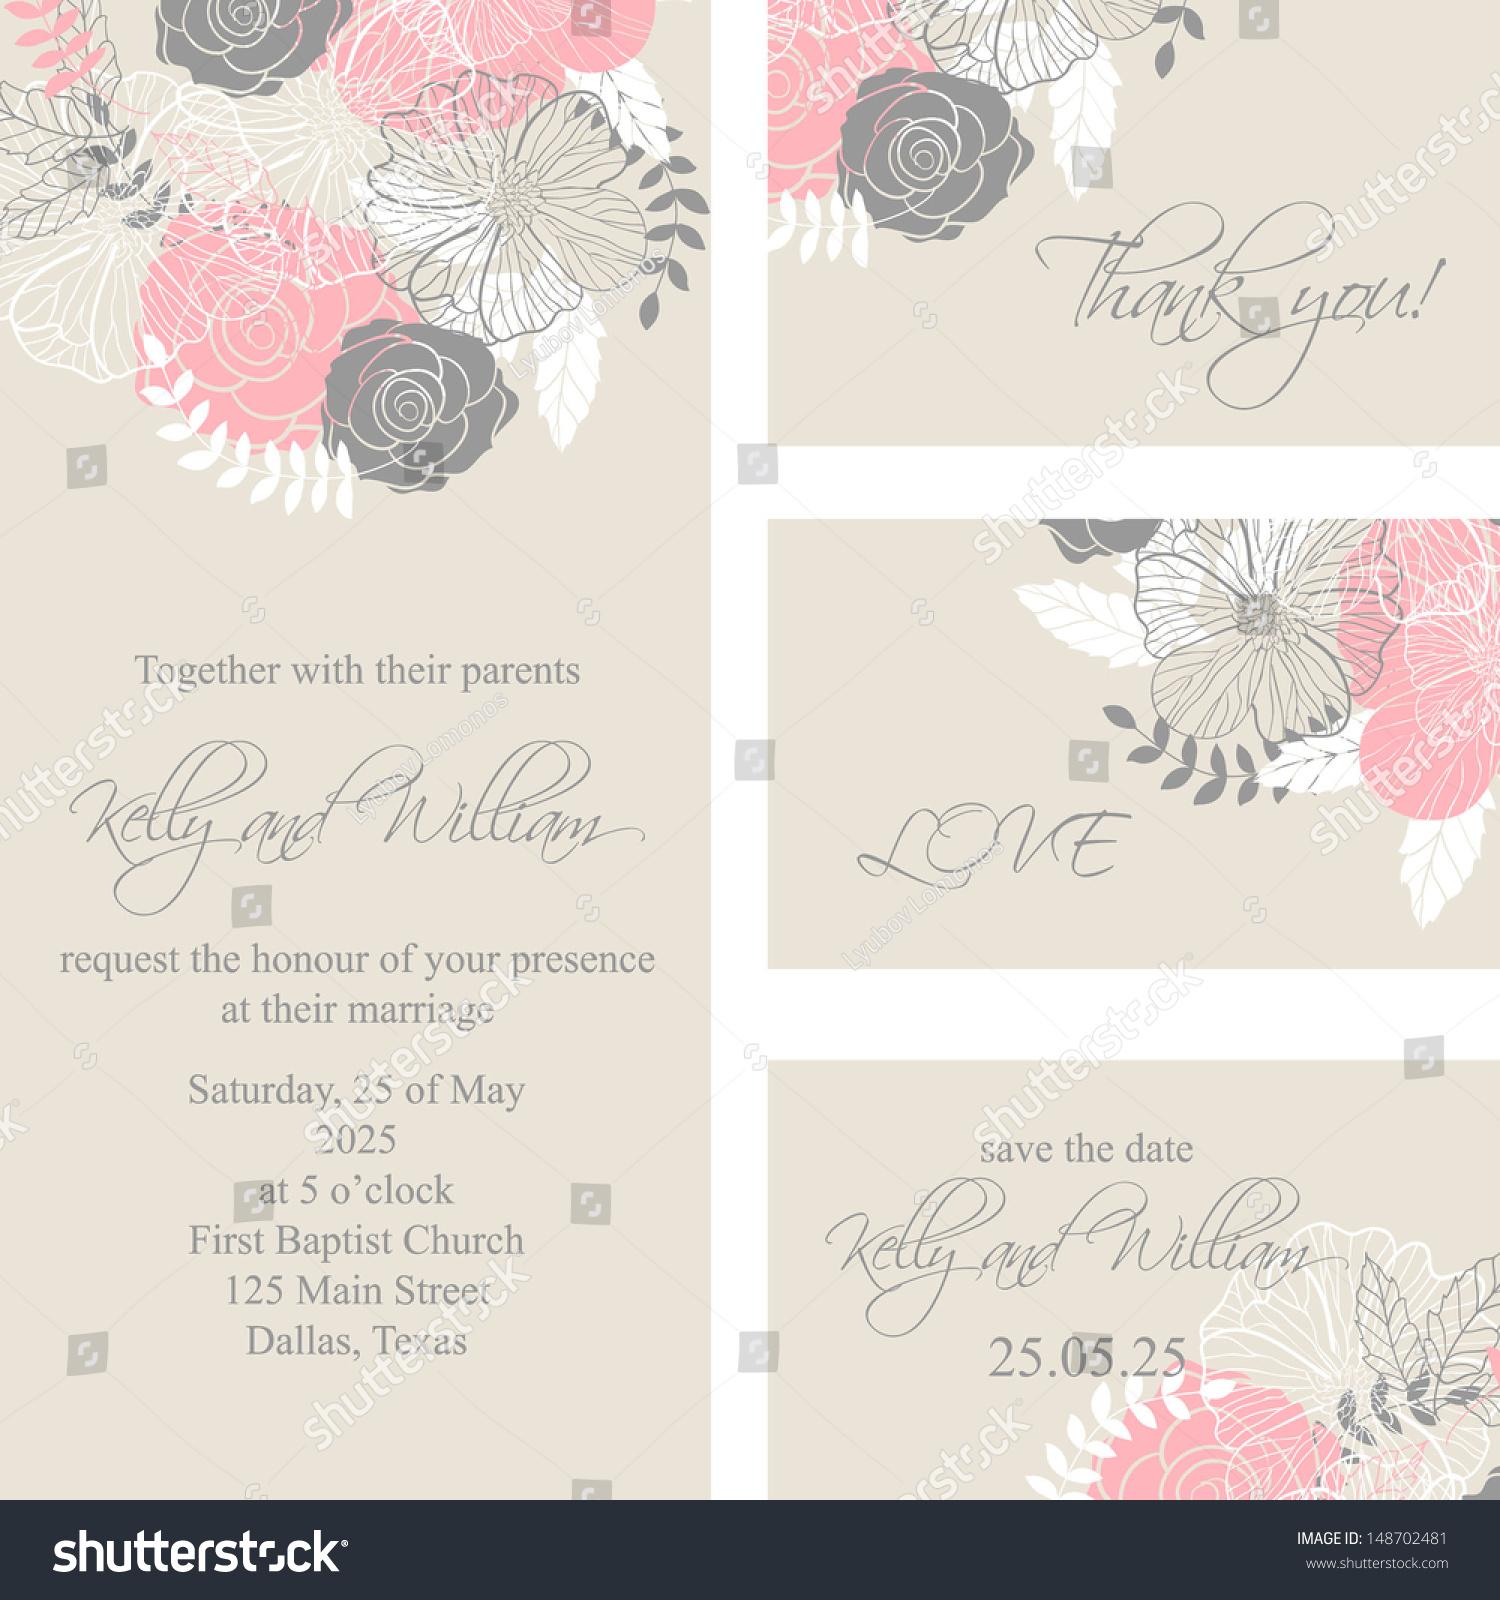 Wedding Invitation Thank You Card Save Stock Vector 2018 148702481